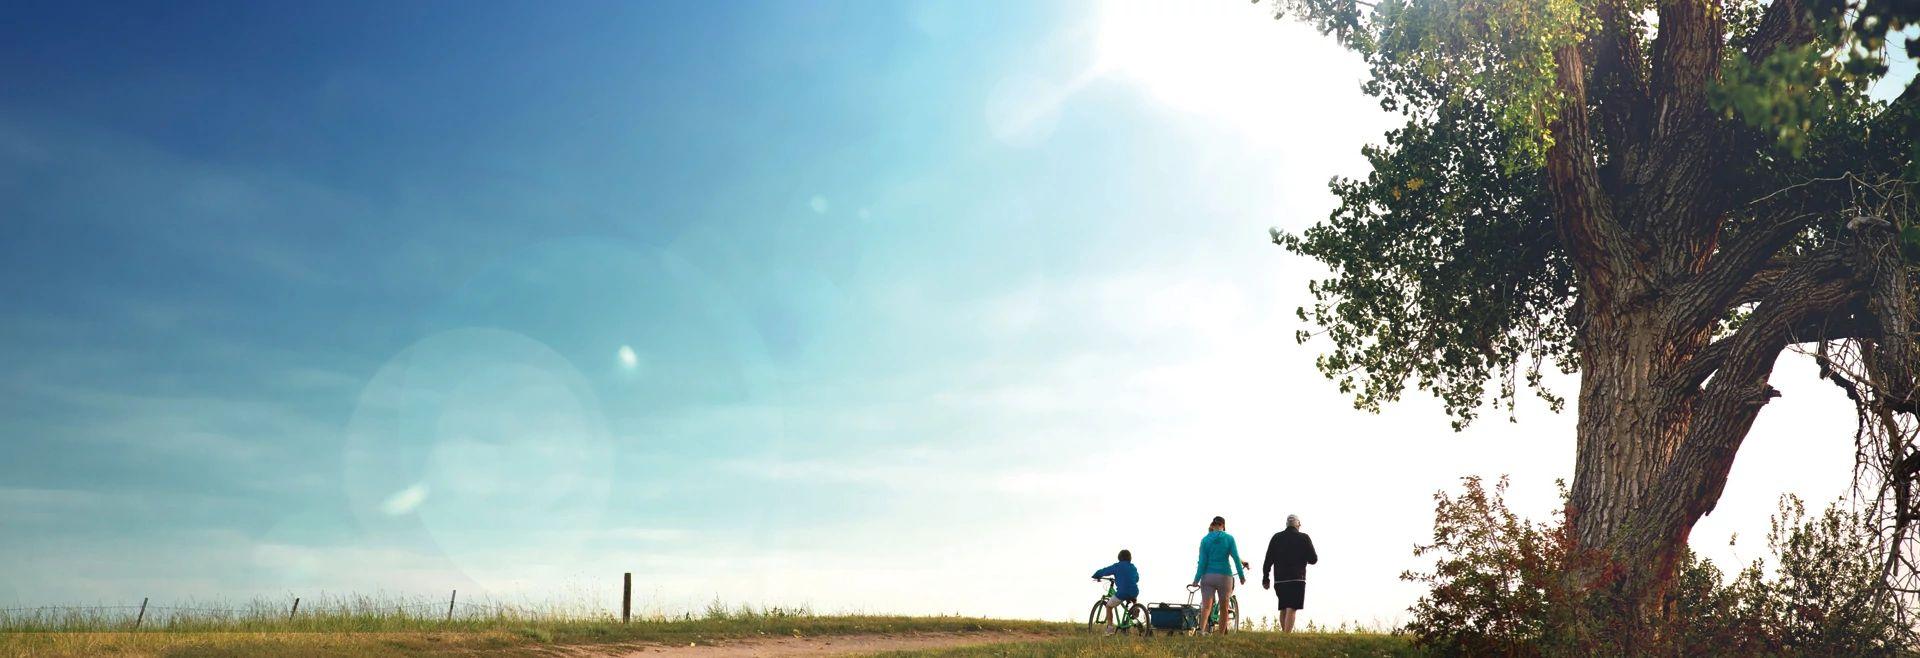 Solstice Lifestyle Summer Walking Trail